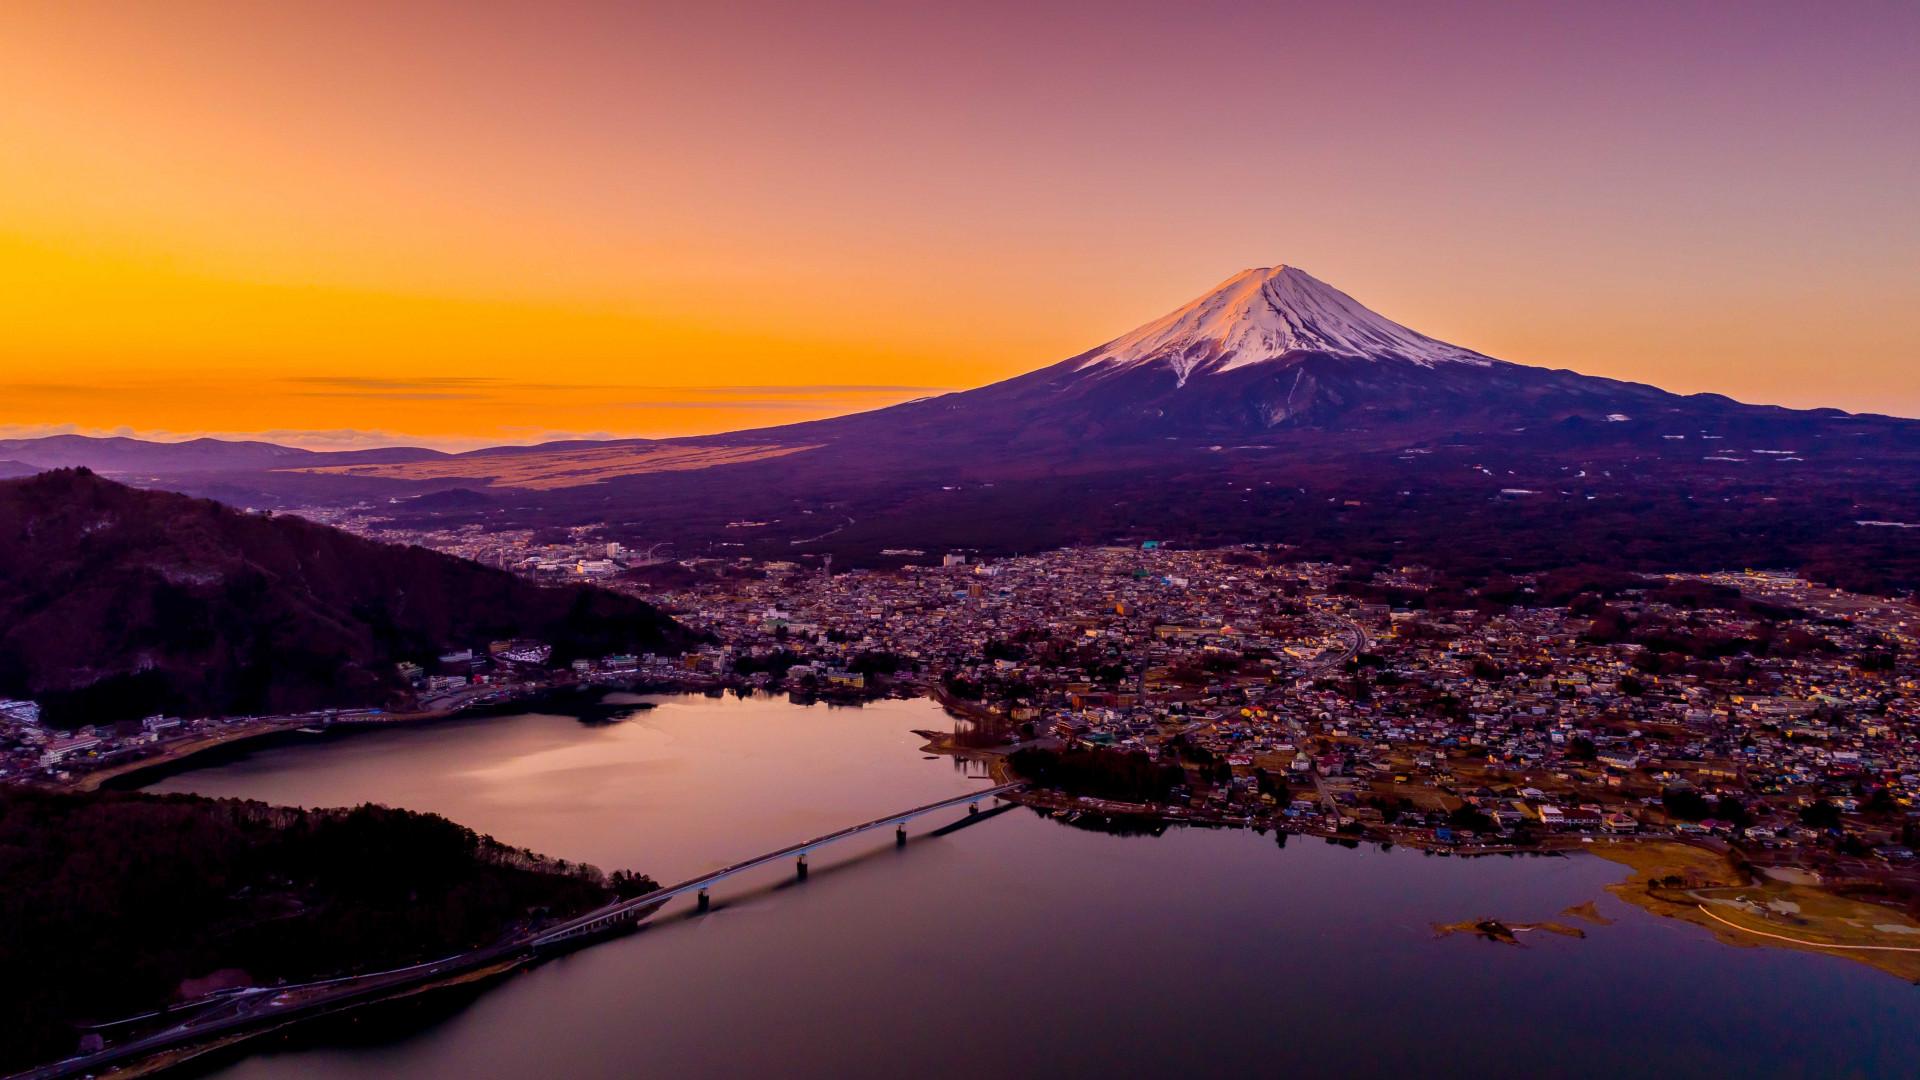 Japan Rugby World Cup 2019: Mount Fuji, reflected in lake Kawaguchi, Japan